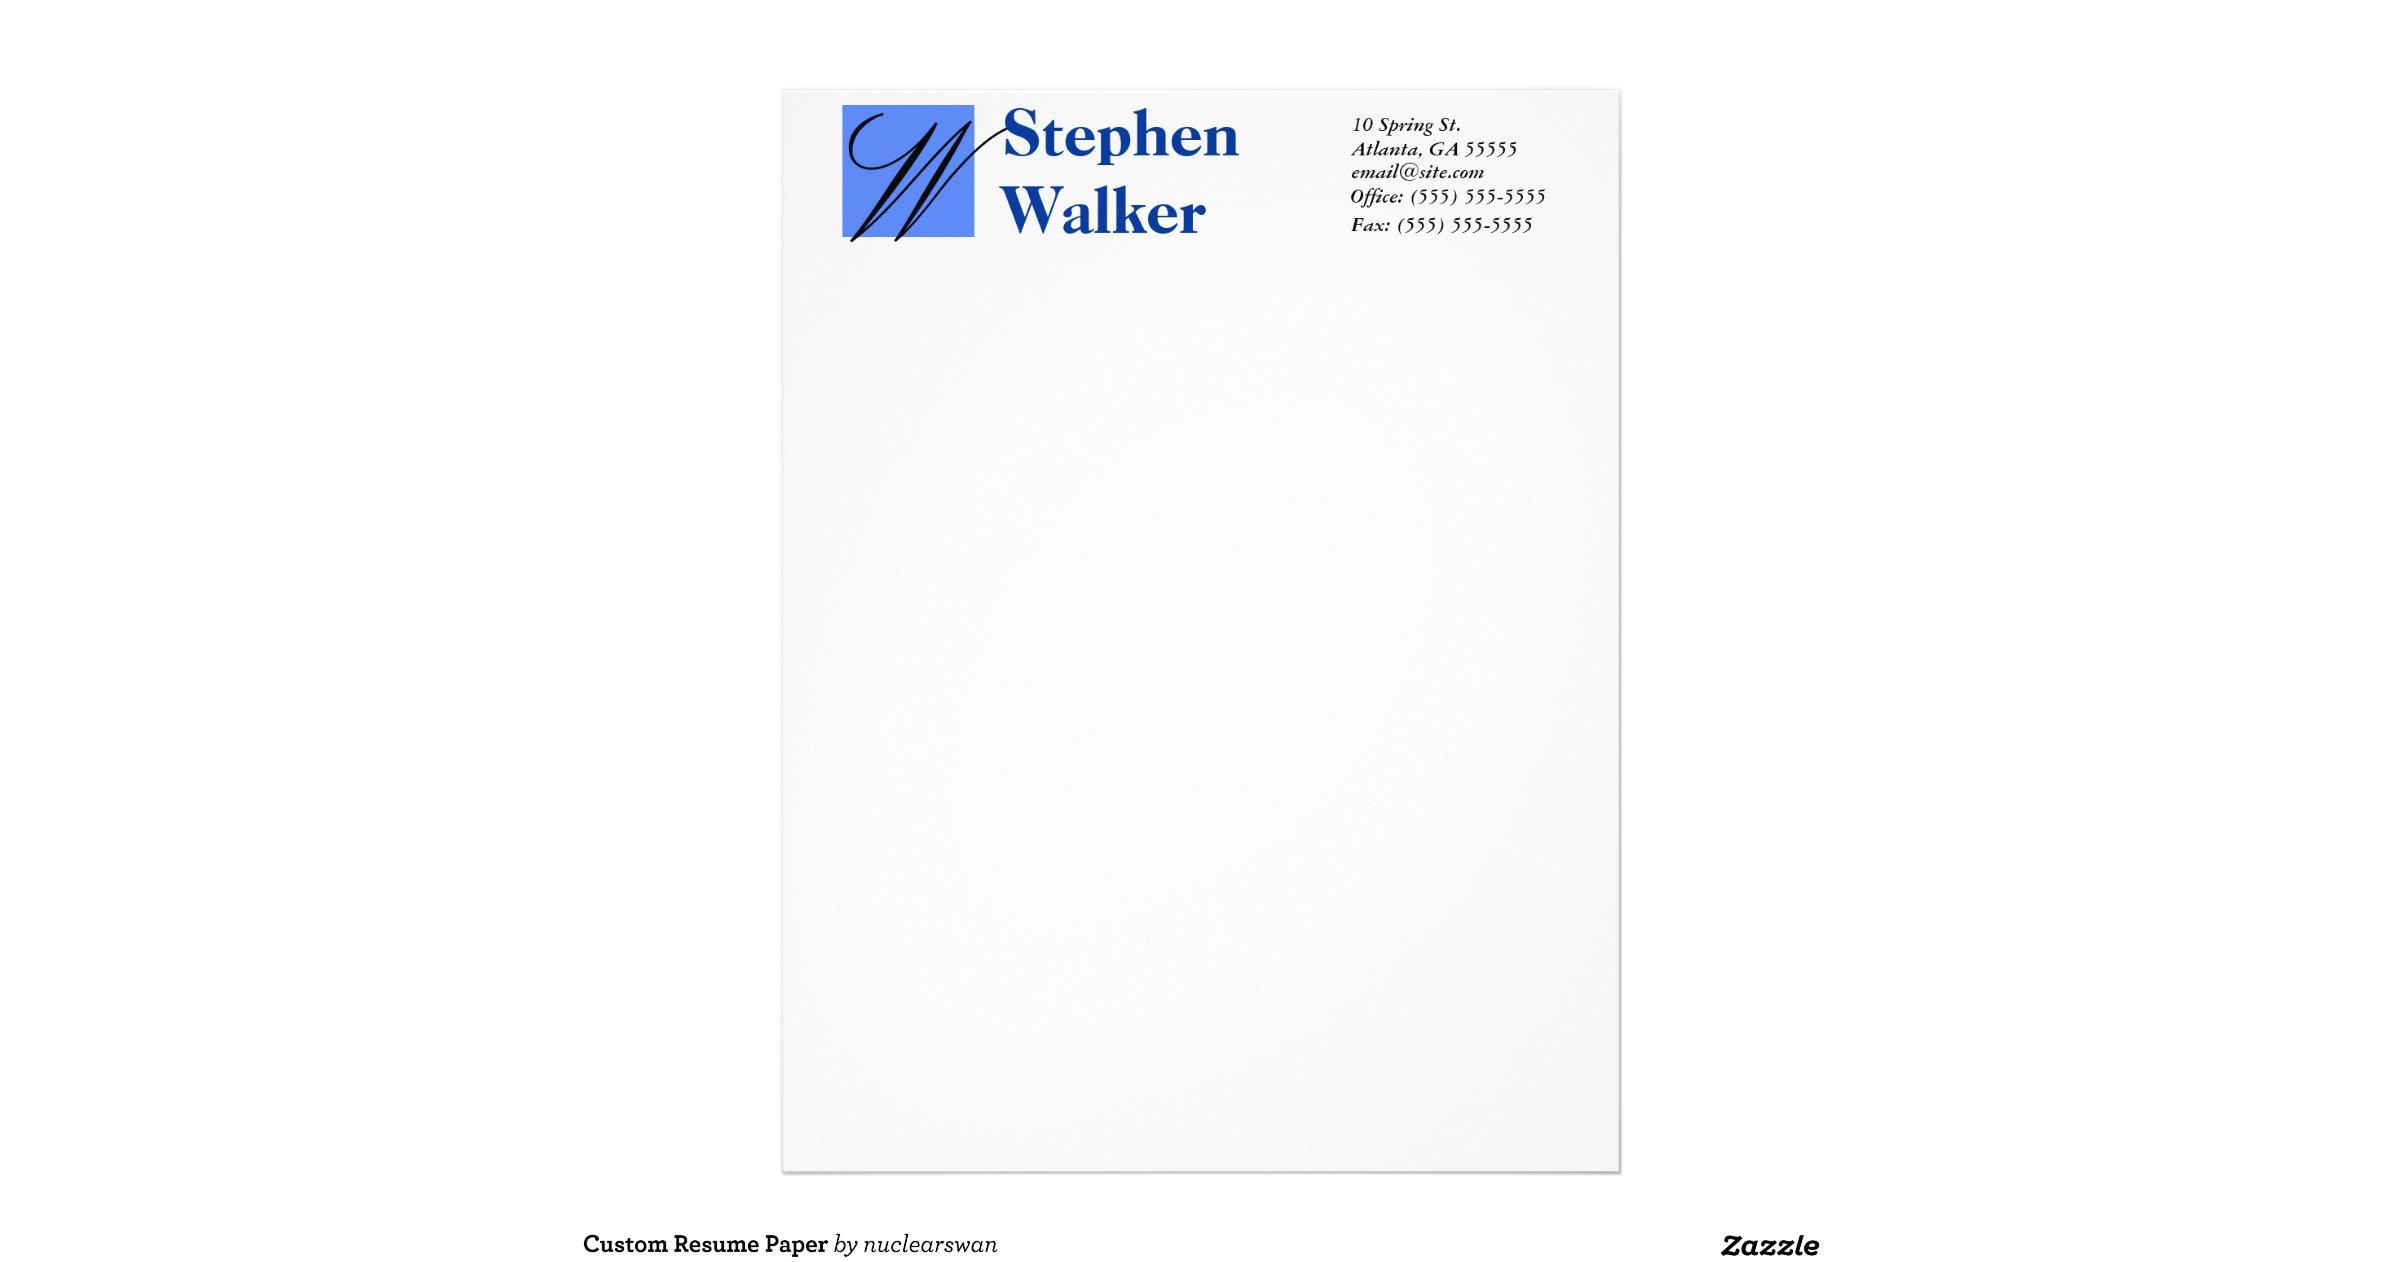 representative resume summary qualifications - Best custom paper ...